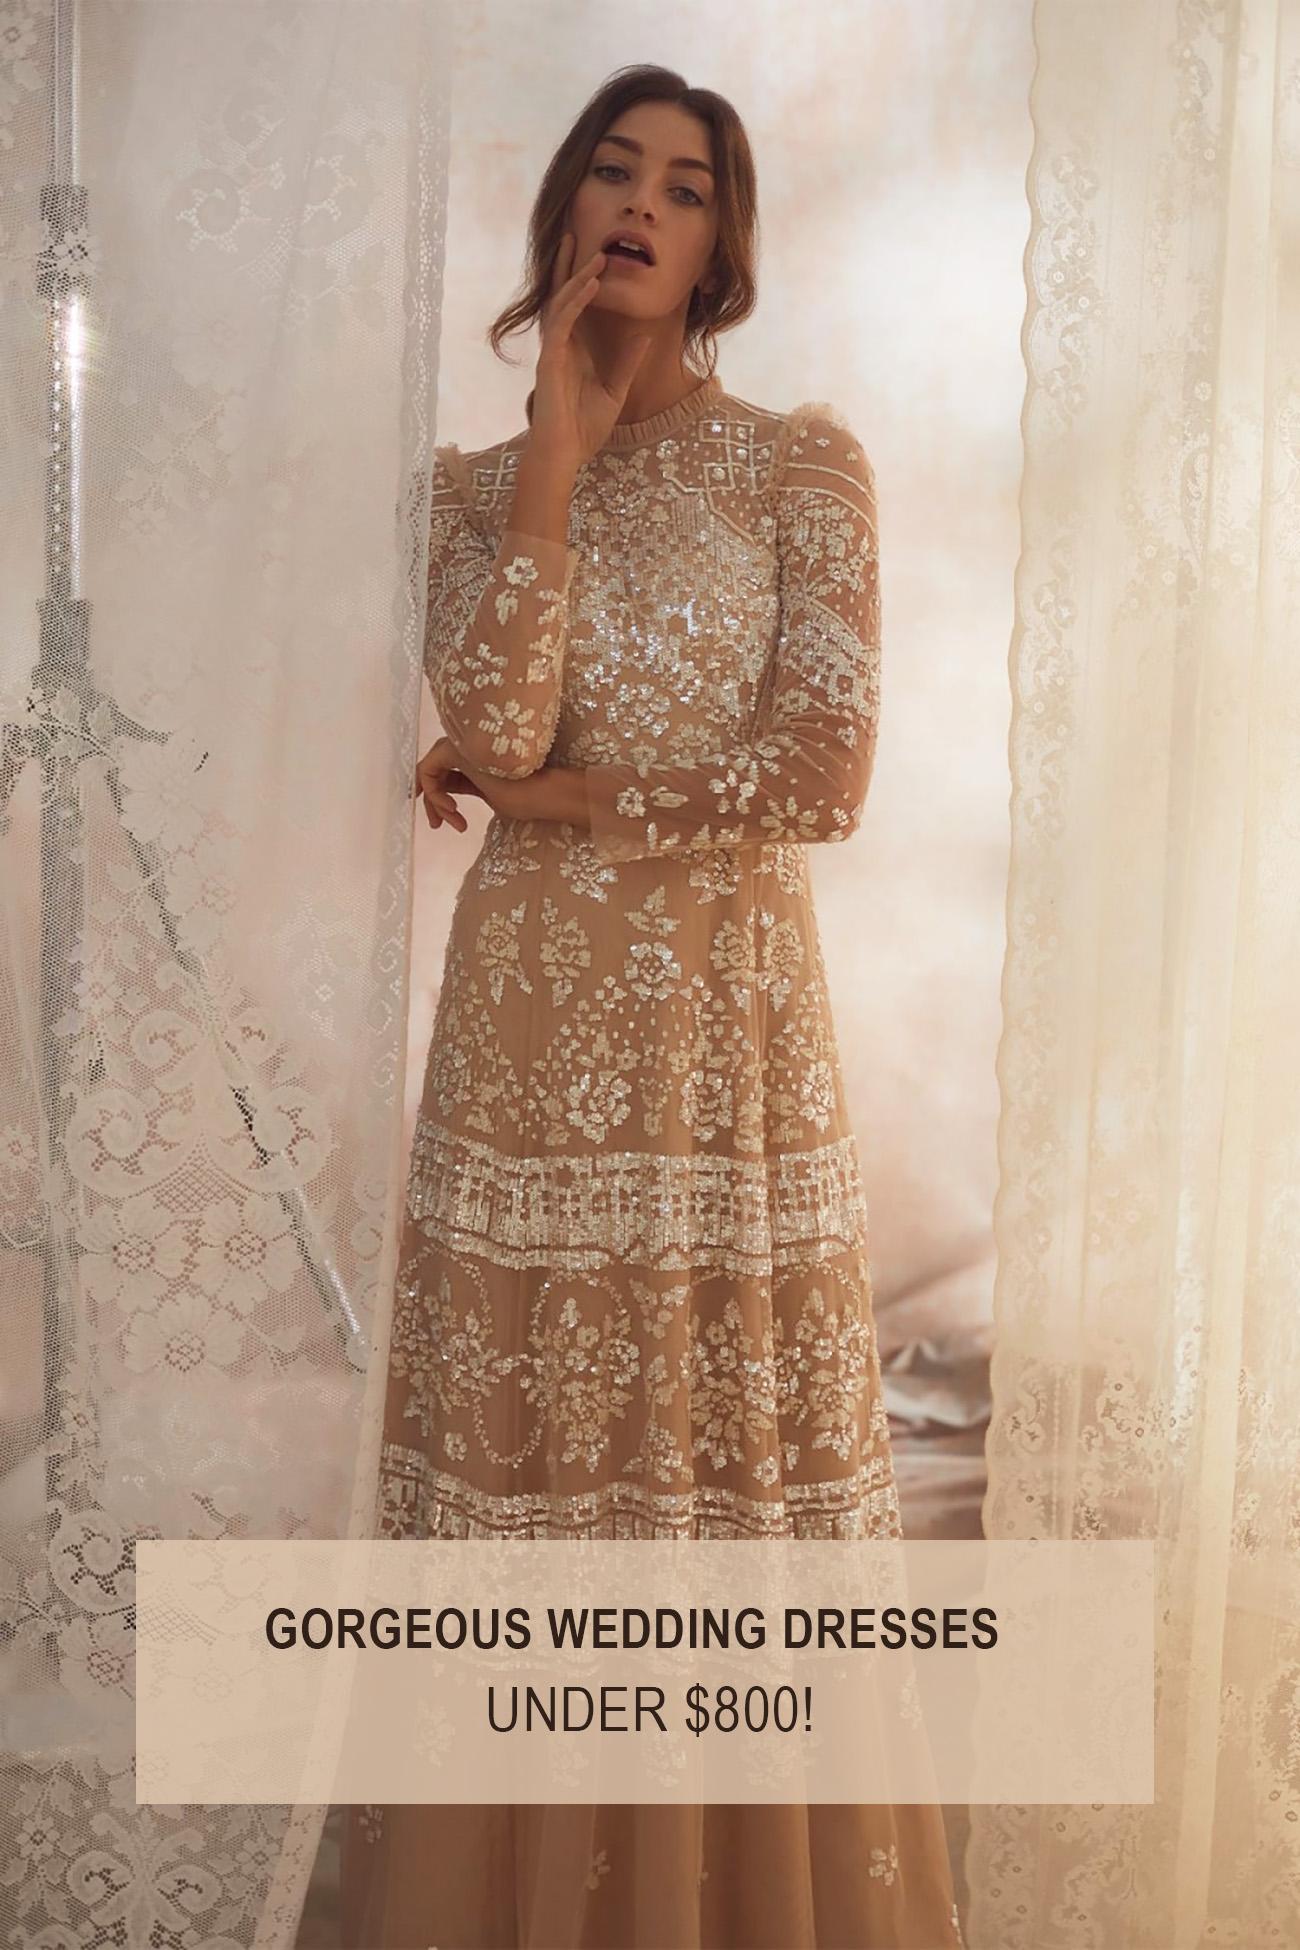 gorgeous wedding dresses under $800